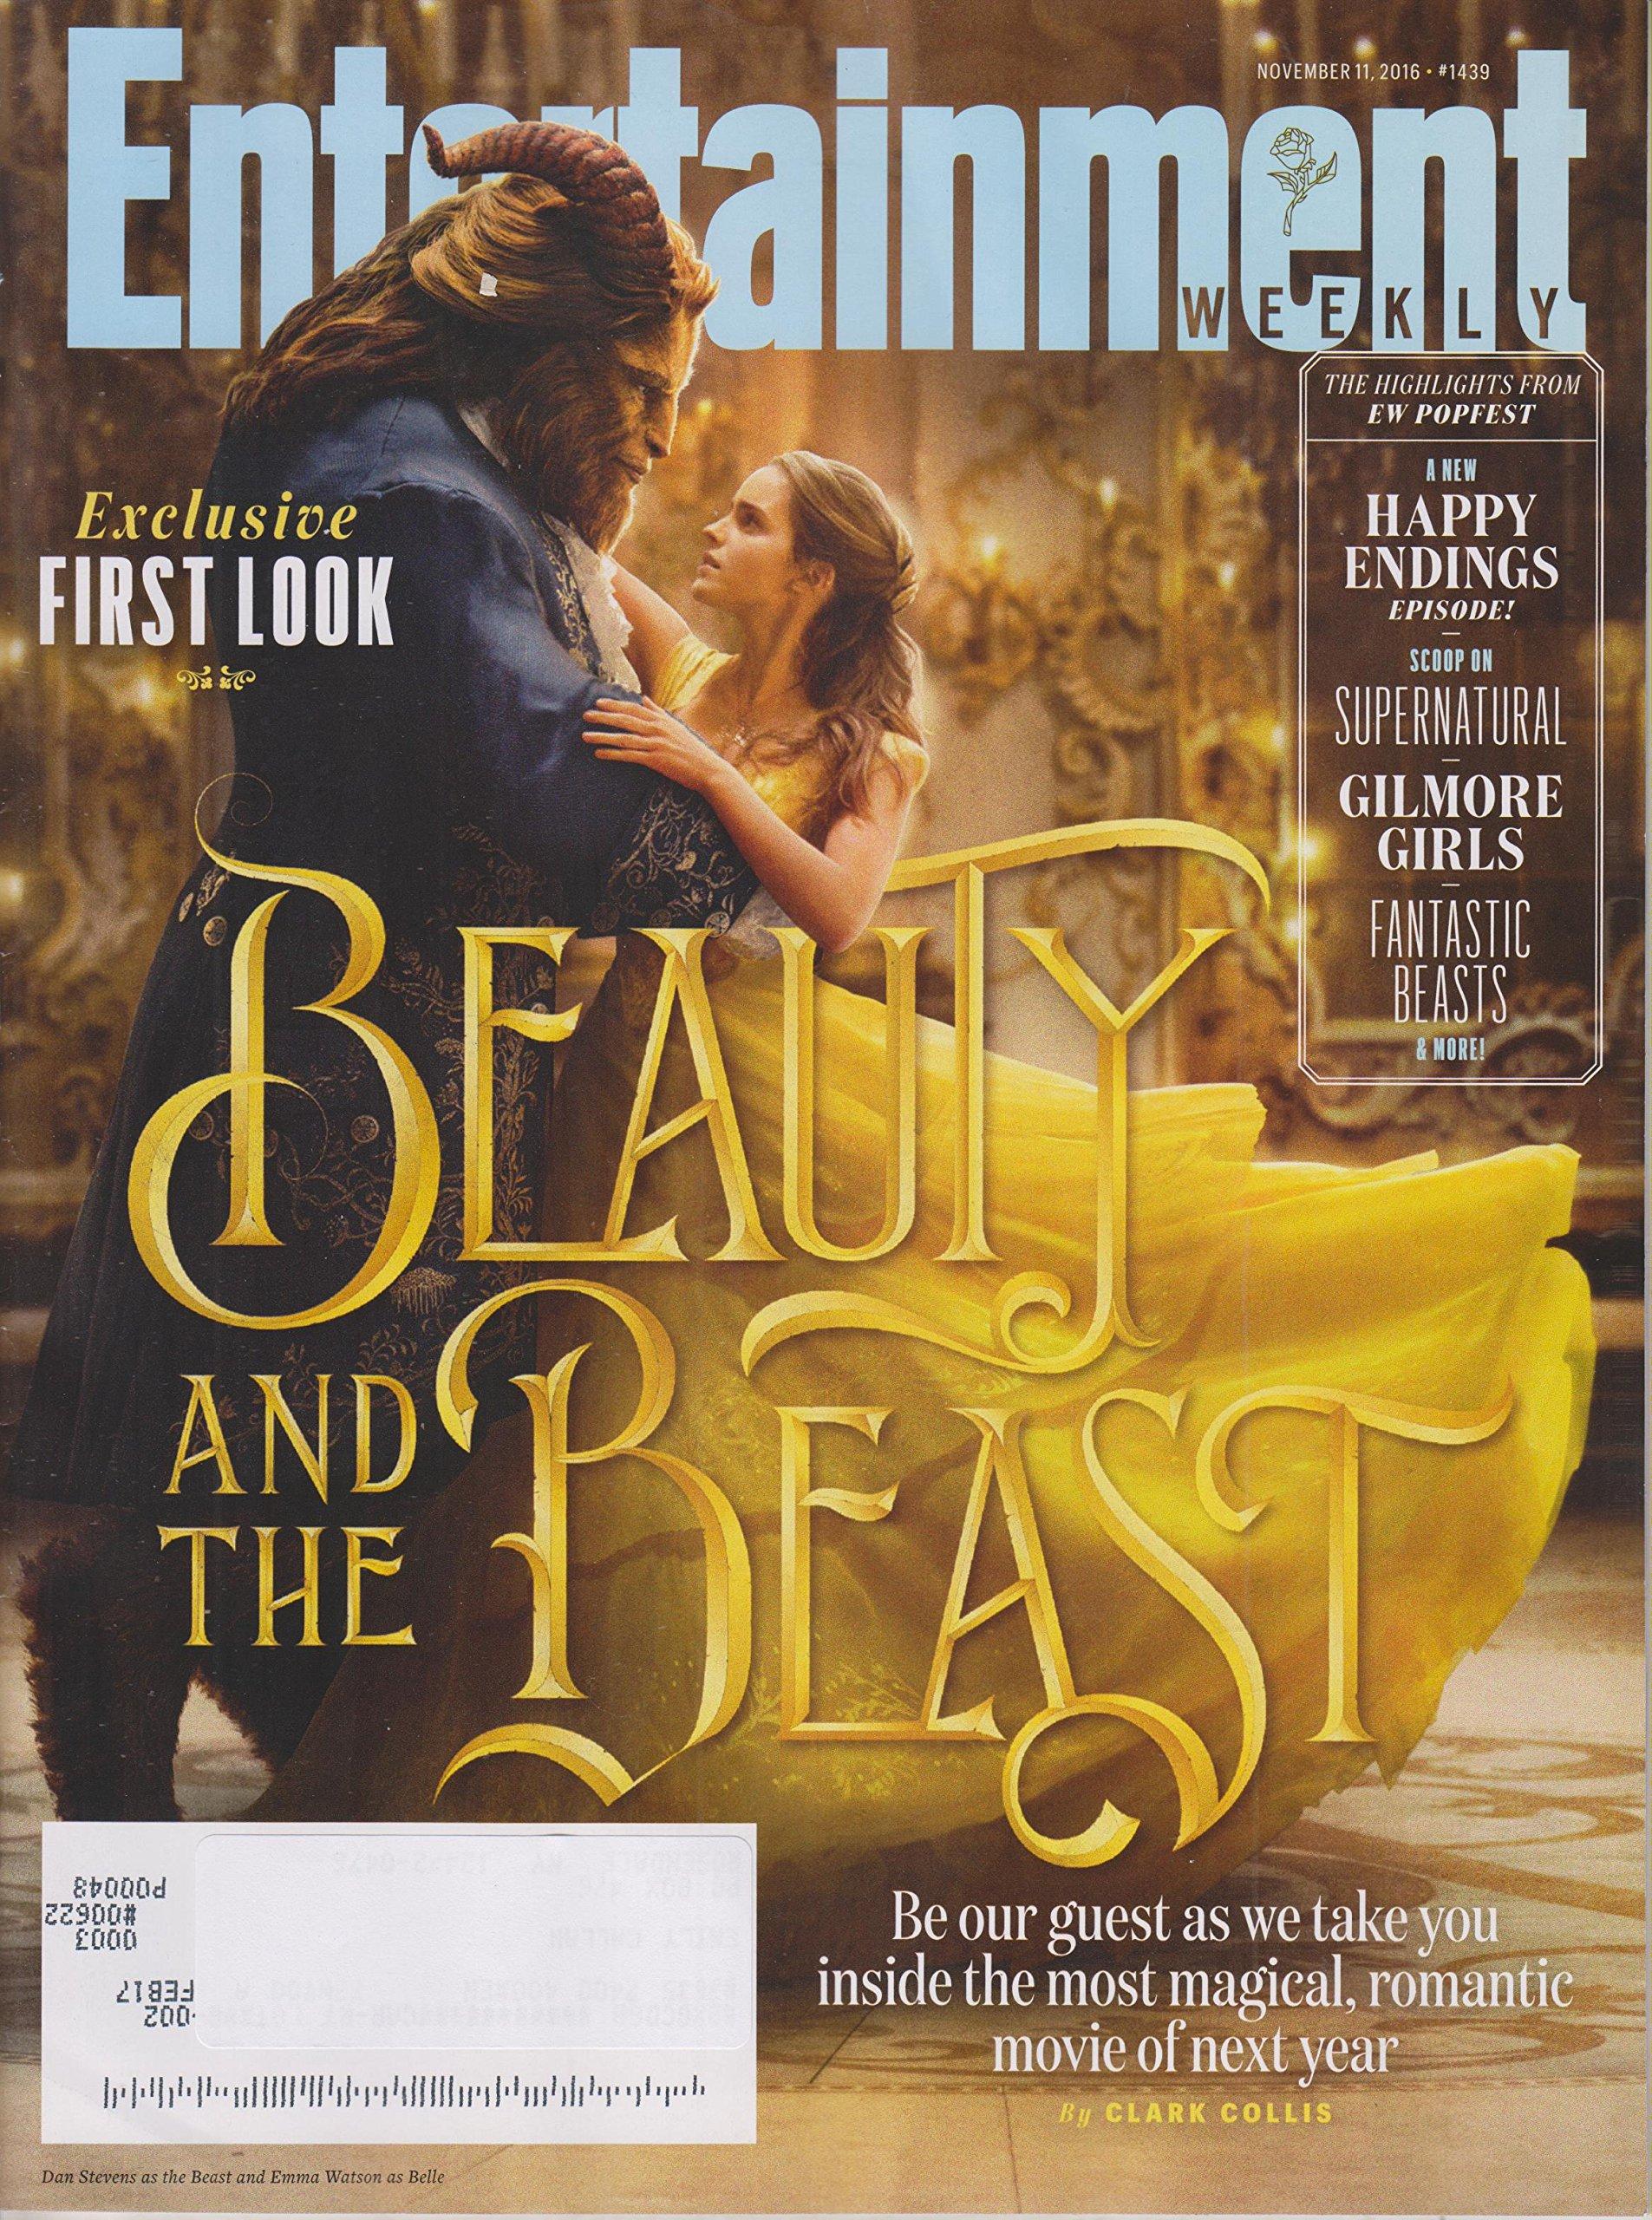 Entertainment Weekly November 11, 2016 Dan Stevens & Emma Watson Beauty & The Beast ebook